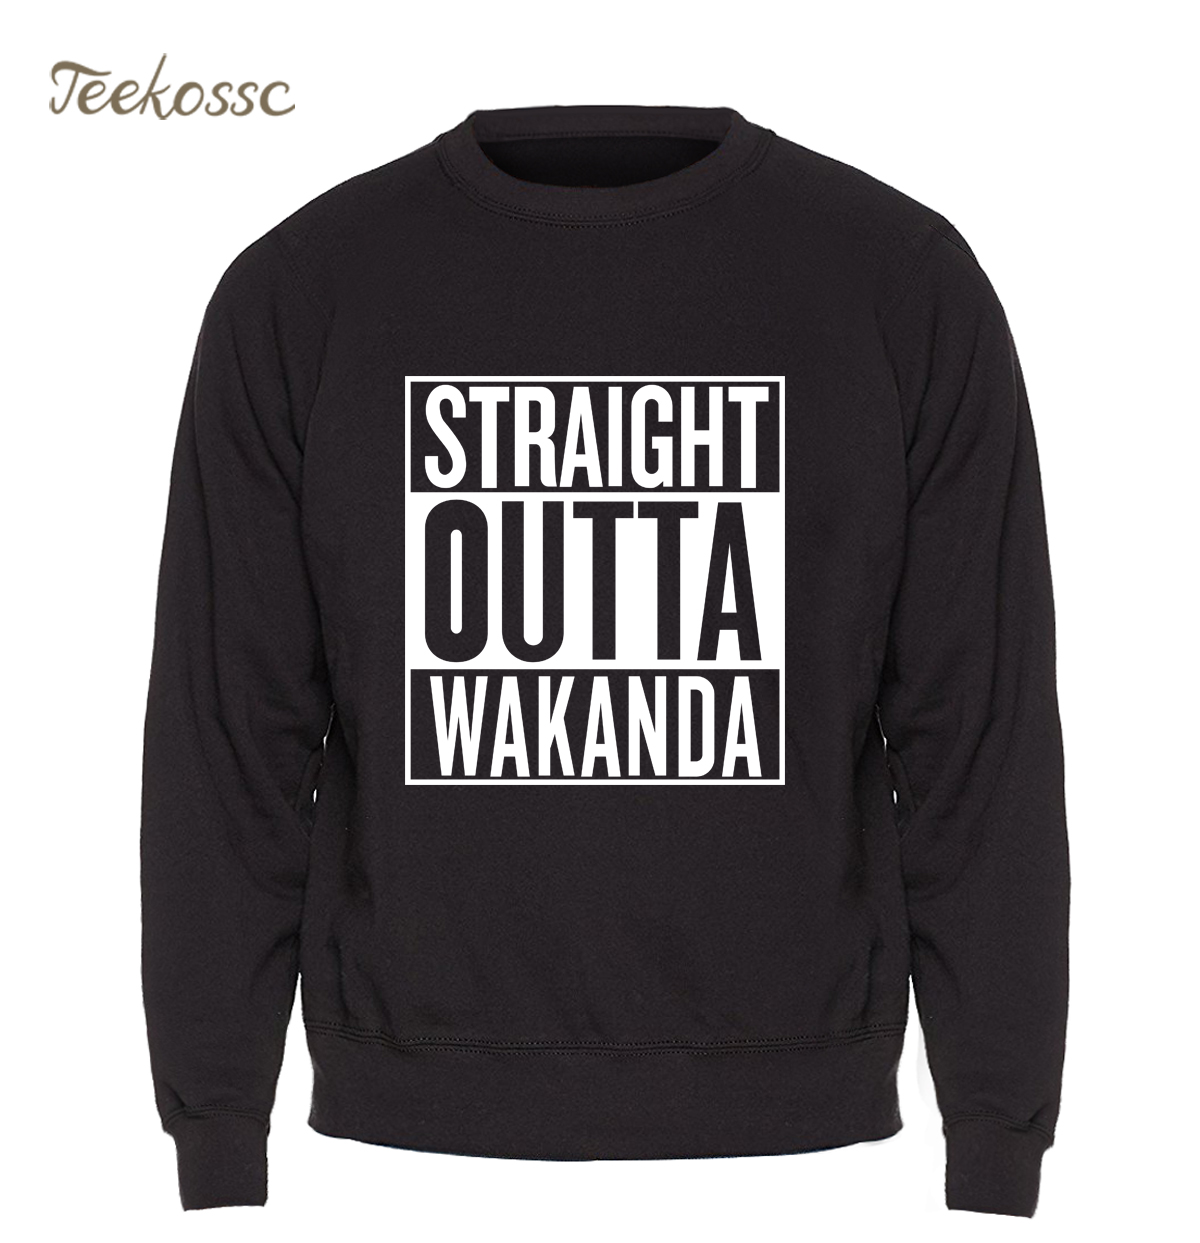 Straight Outta Wakanda Sweatshirt Men Black Panther Wakanda Hoodies Movie Crewneck Sweatshirts Music Hip Hop Sportswear Homme